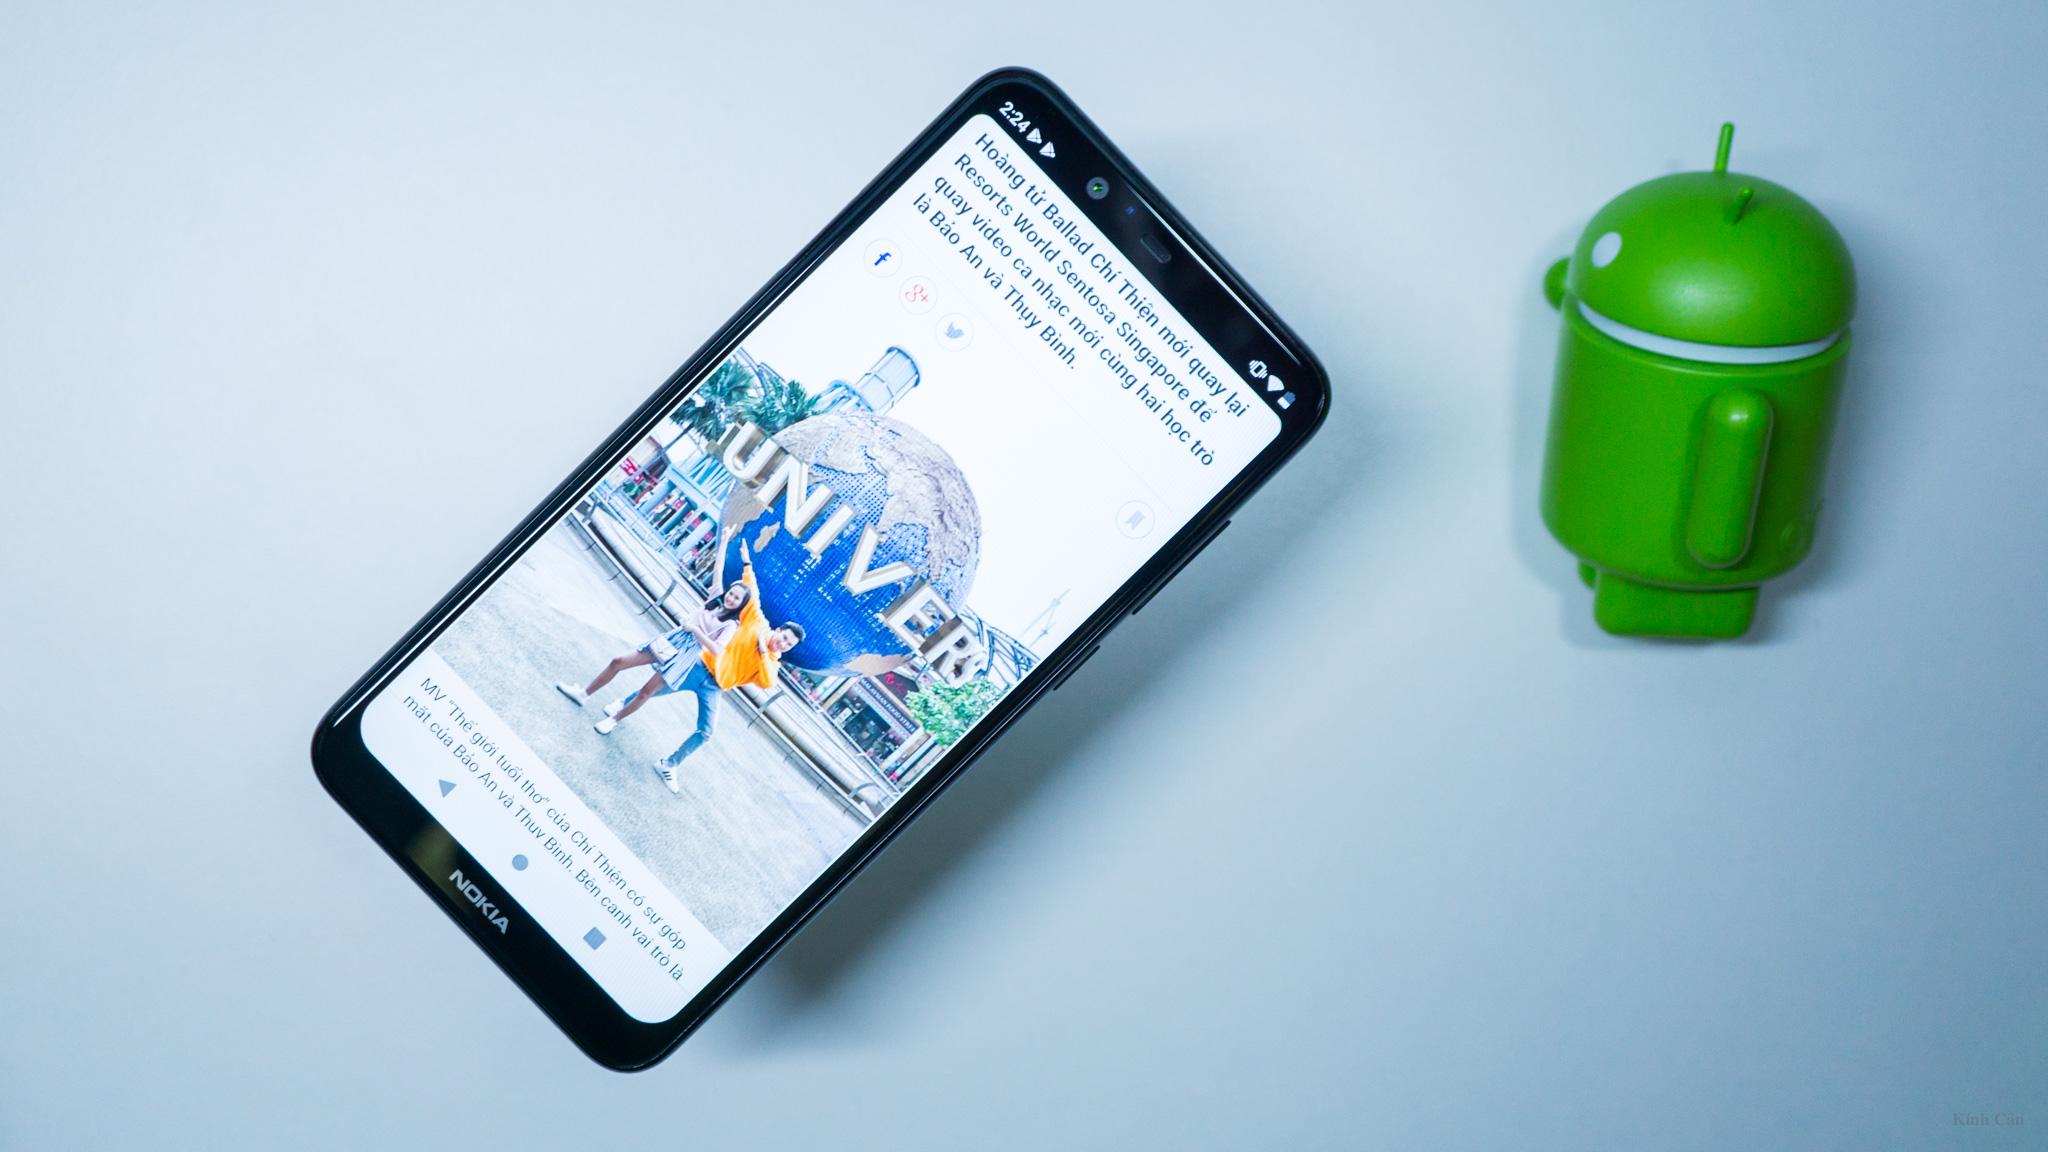 Nokia 5.1 Plus và Nokia 6.1 Plus lên Android 9 Pie_-3.jpg